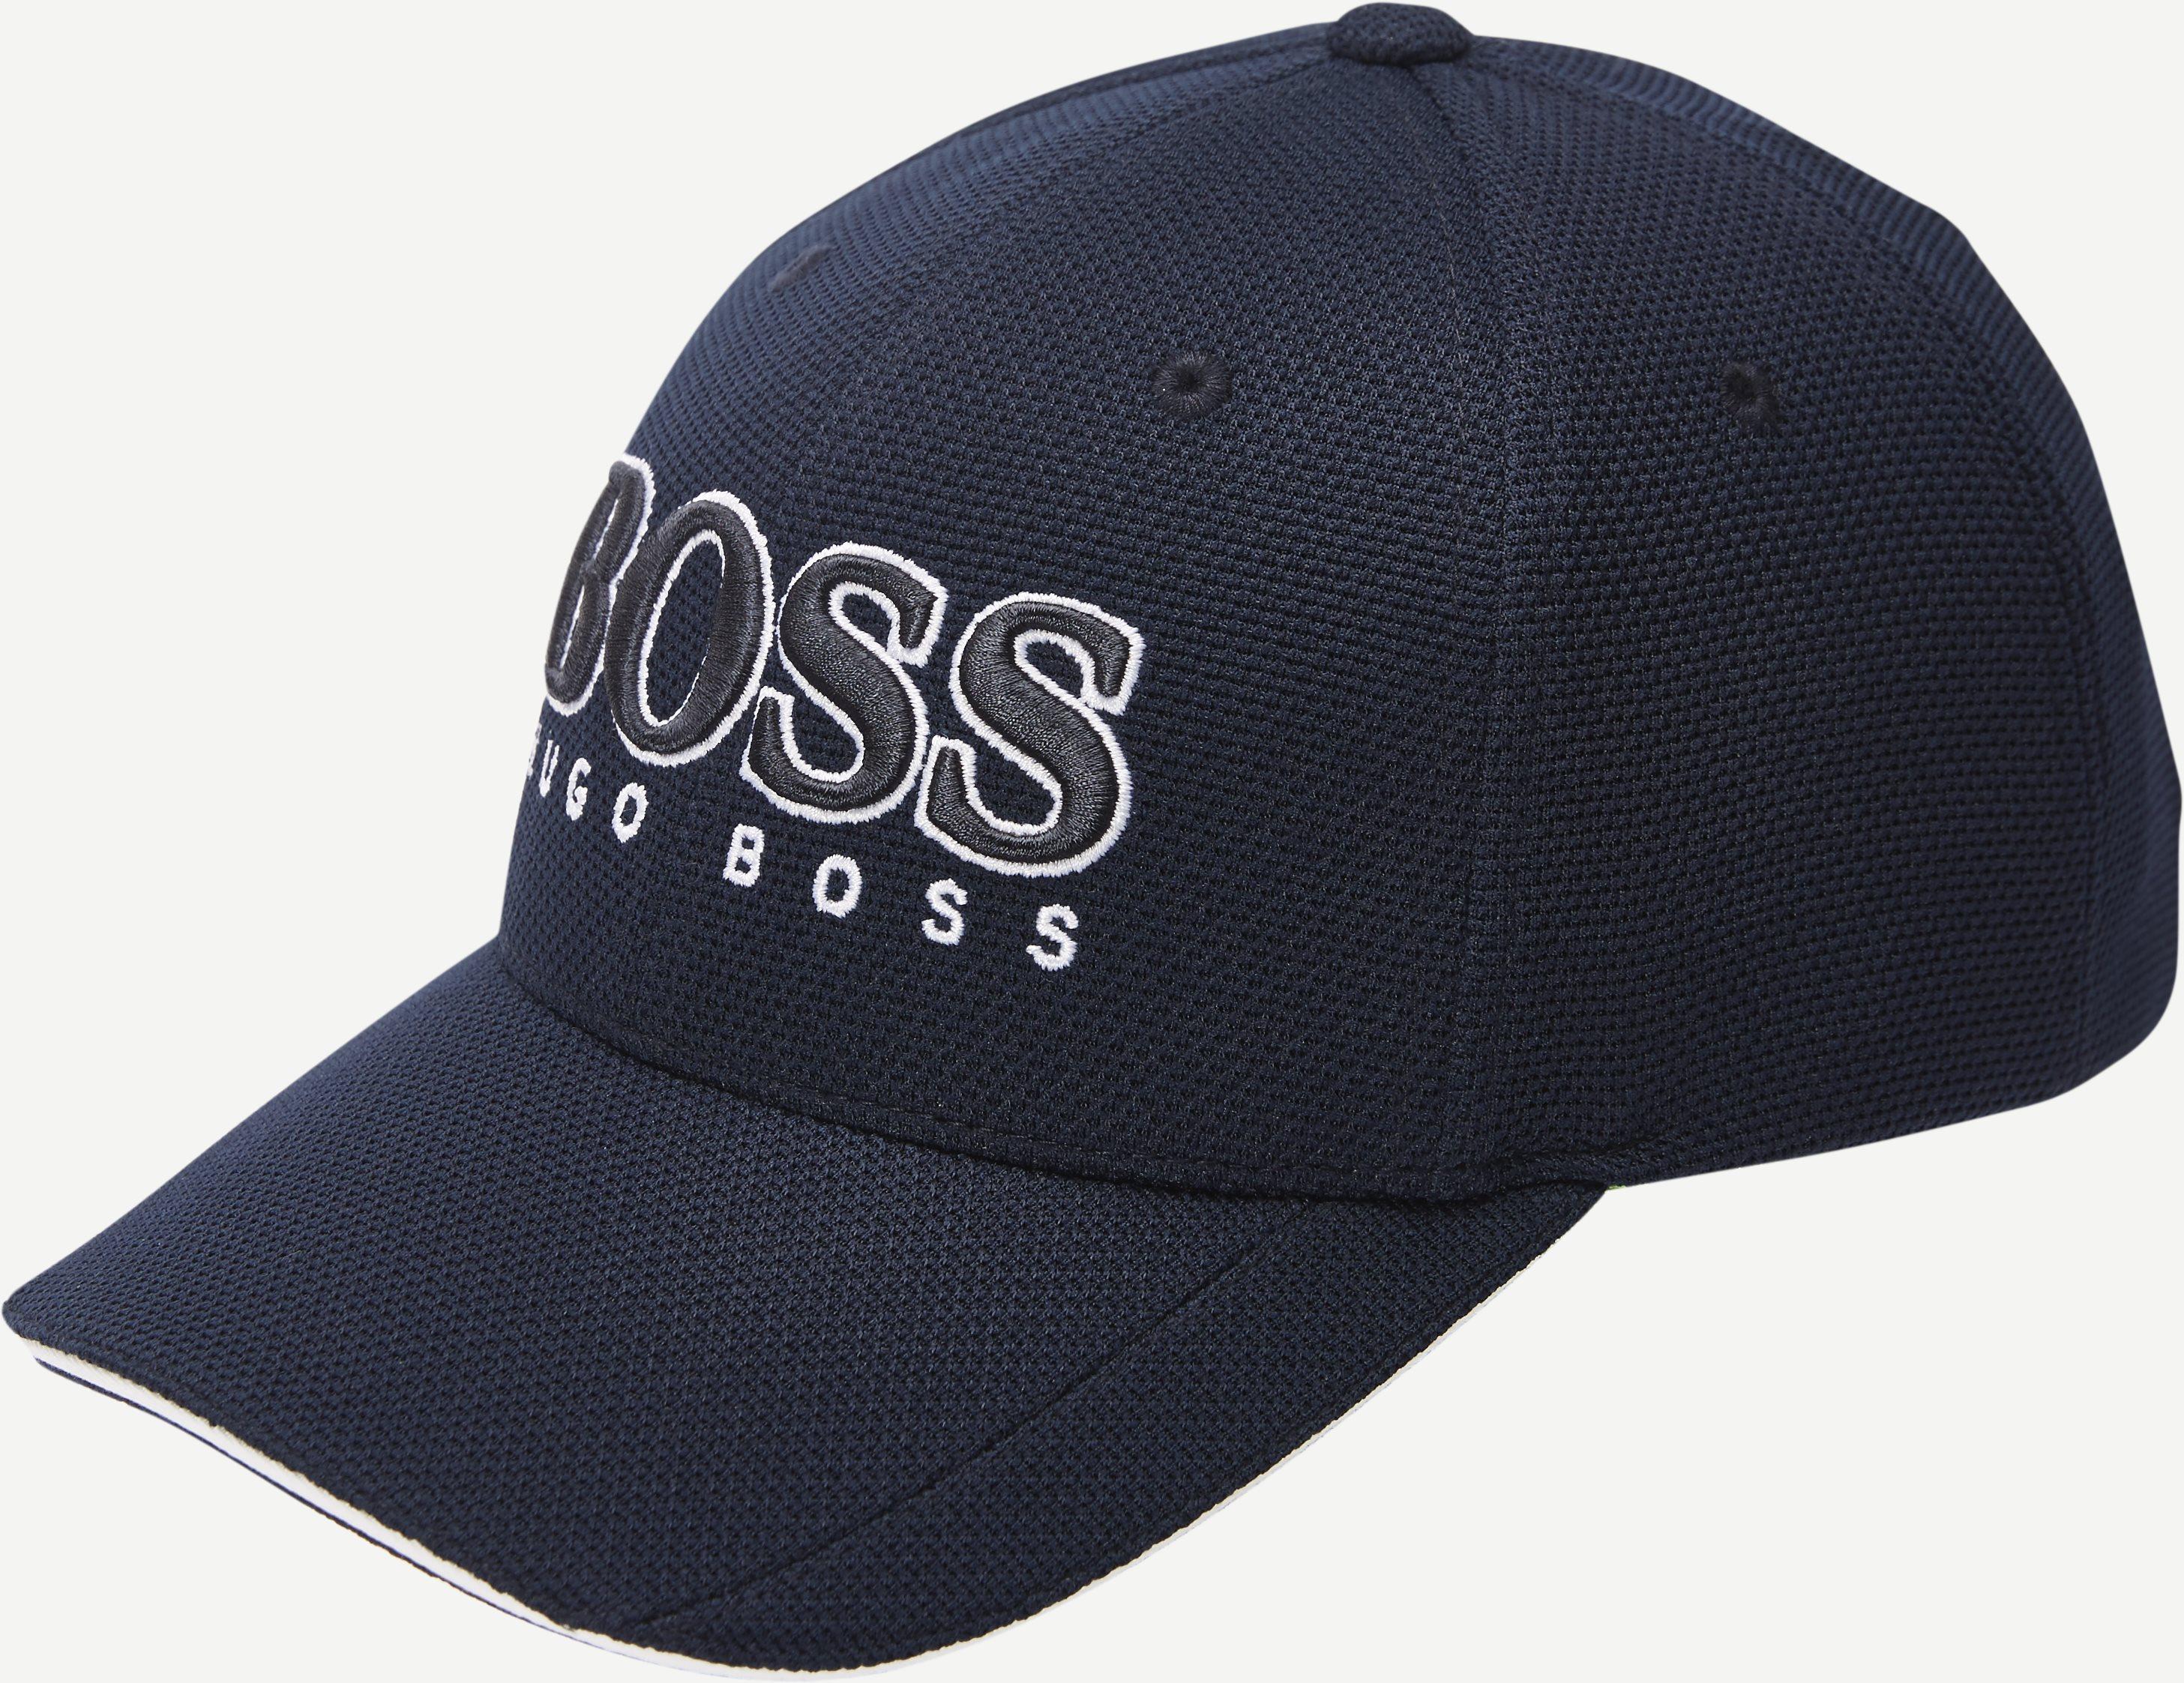 US Baseball Cap - Caps - Blå